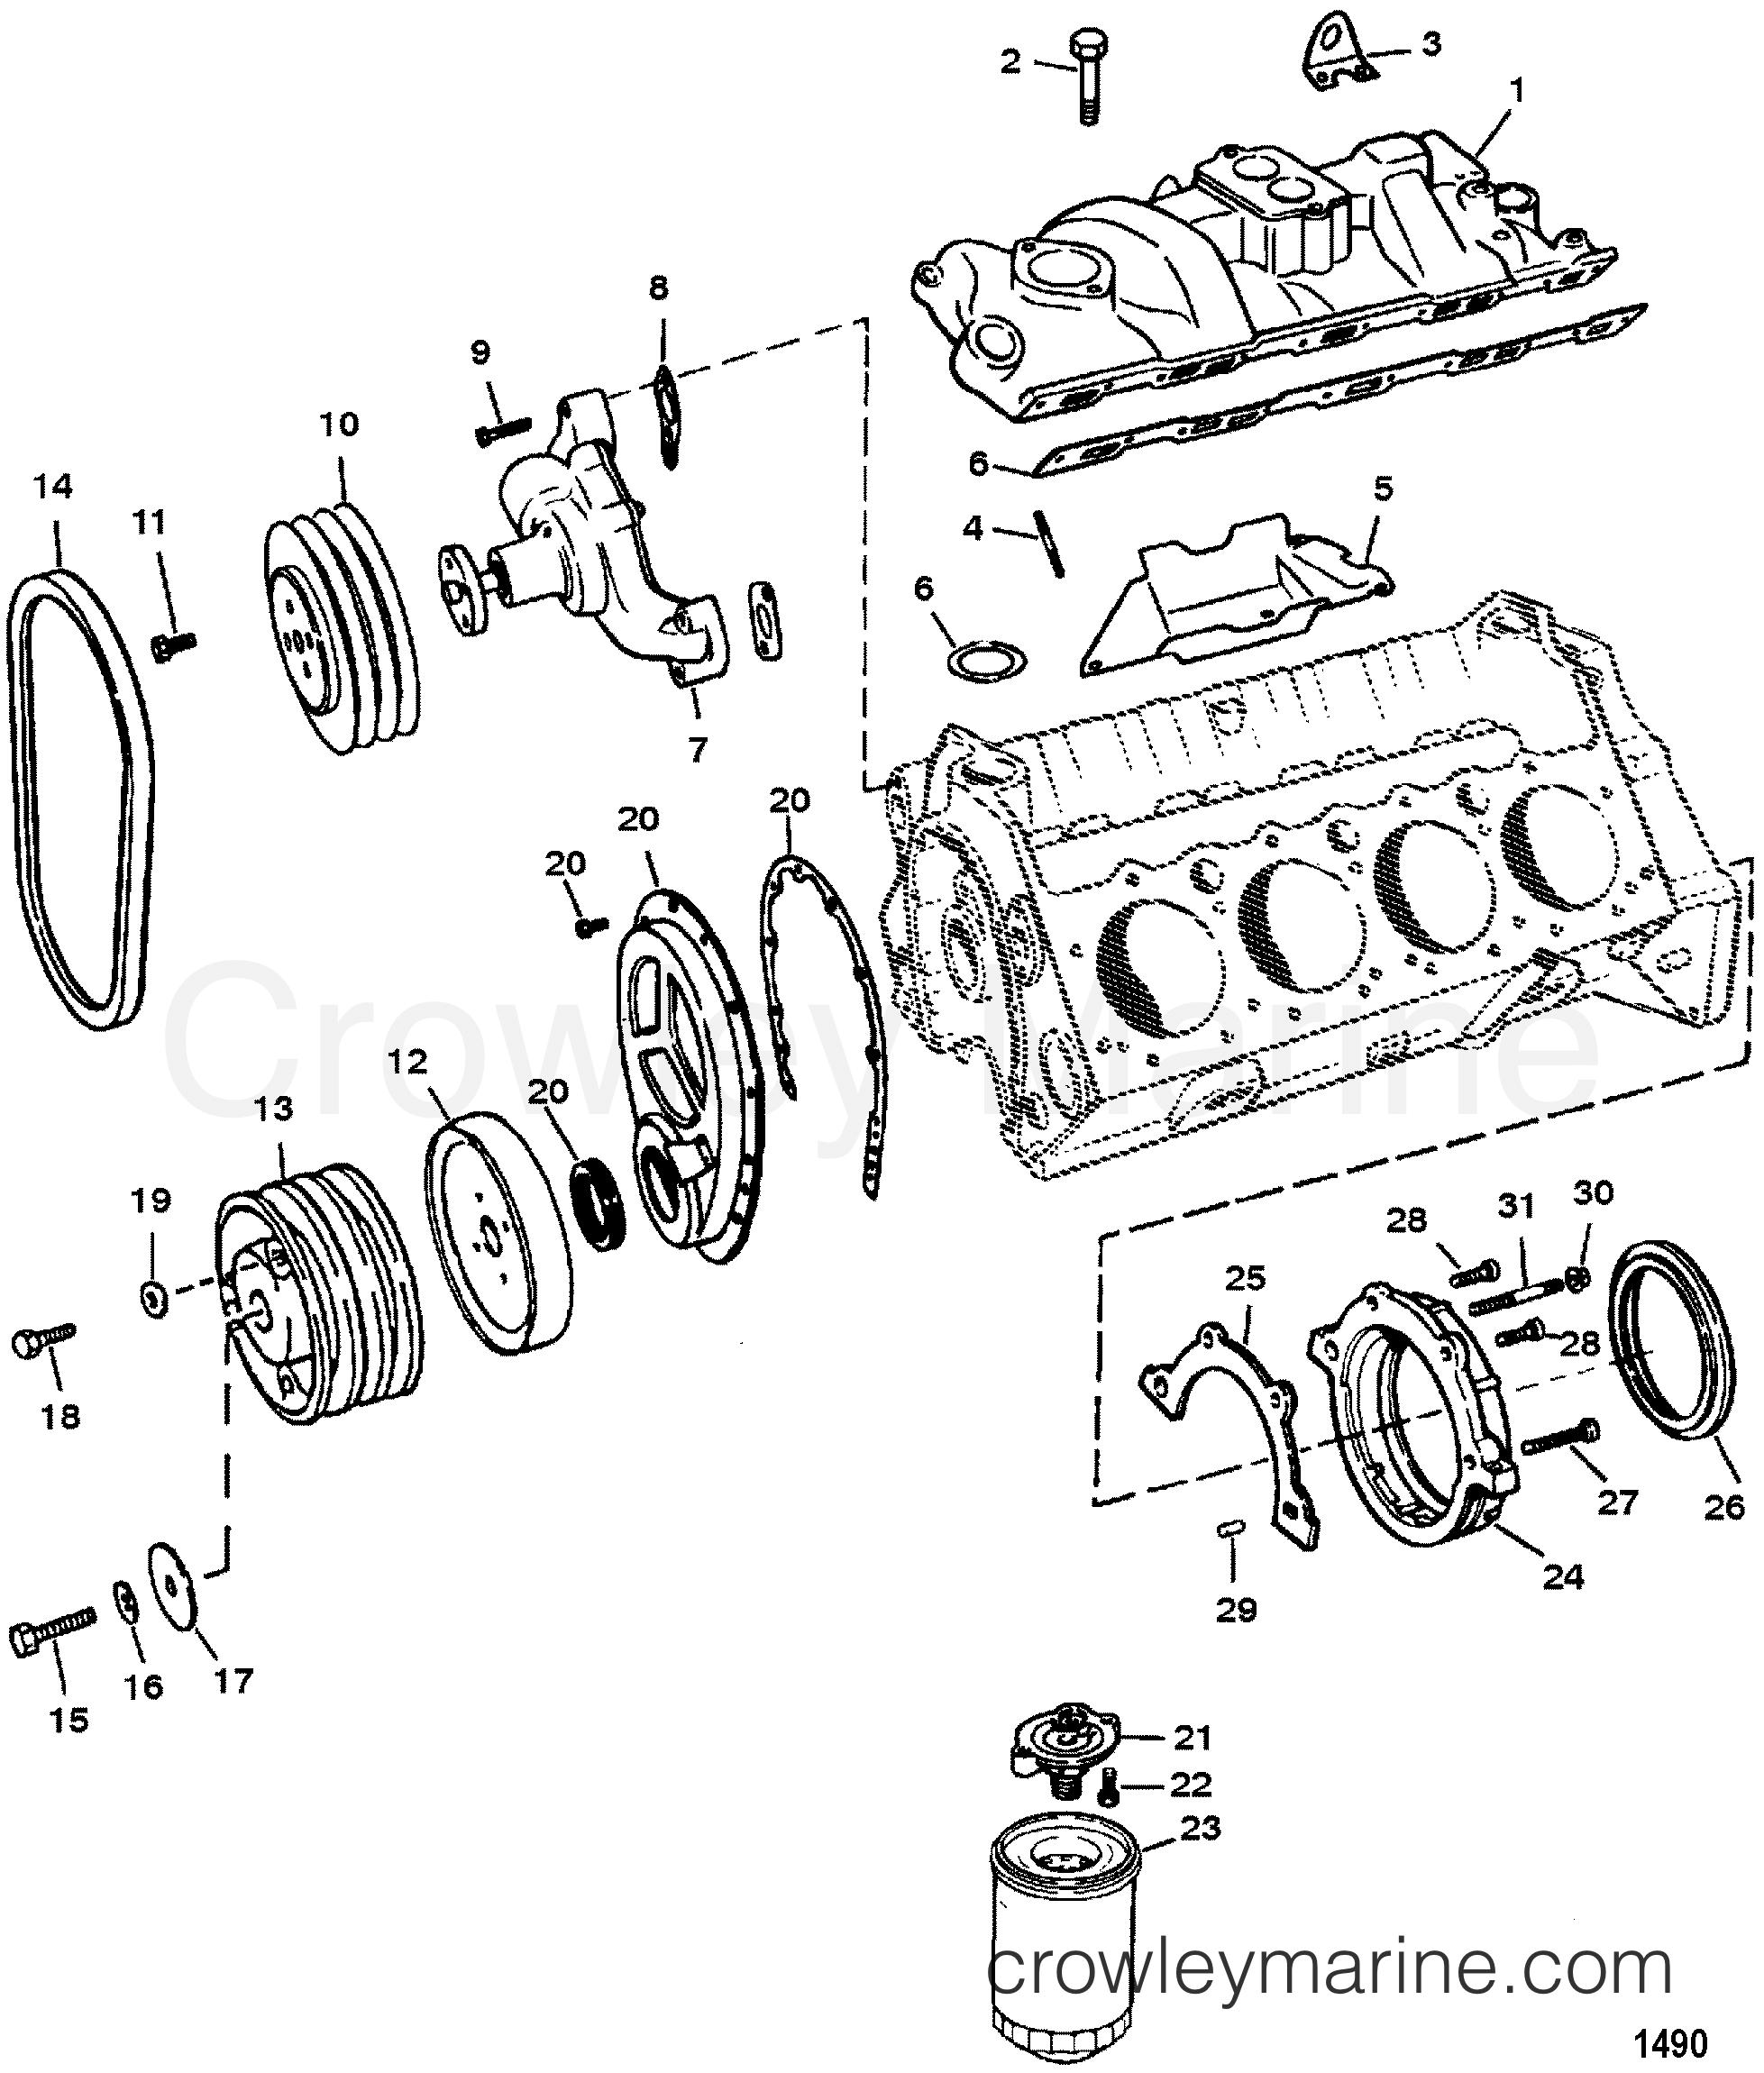 1996 chevy vortec 5 7l vacuum hose diagram chevrolet 5 3l chevy engine diagrams at